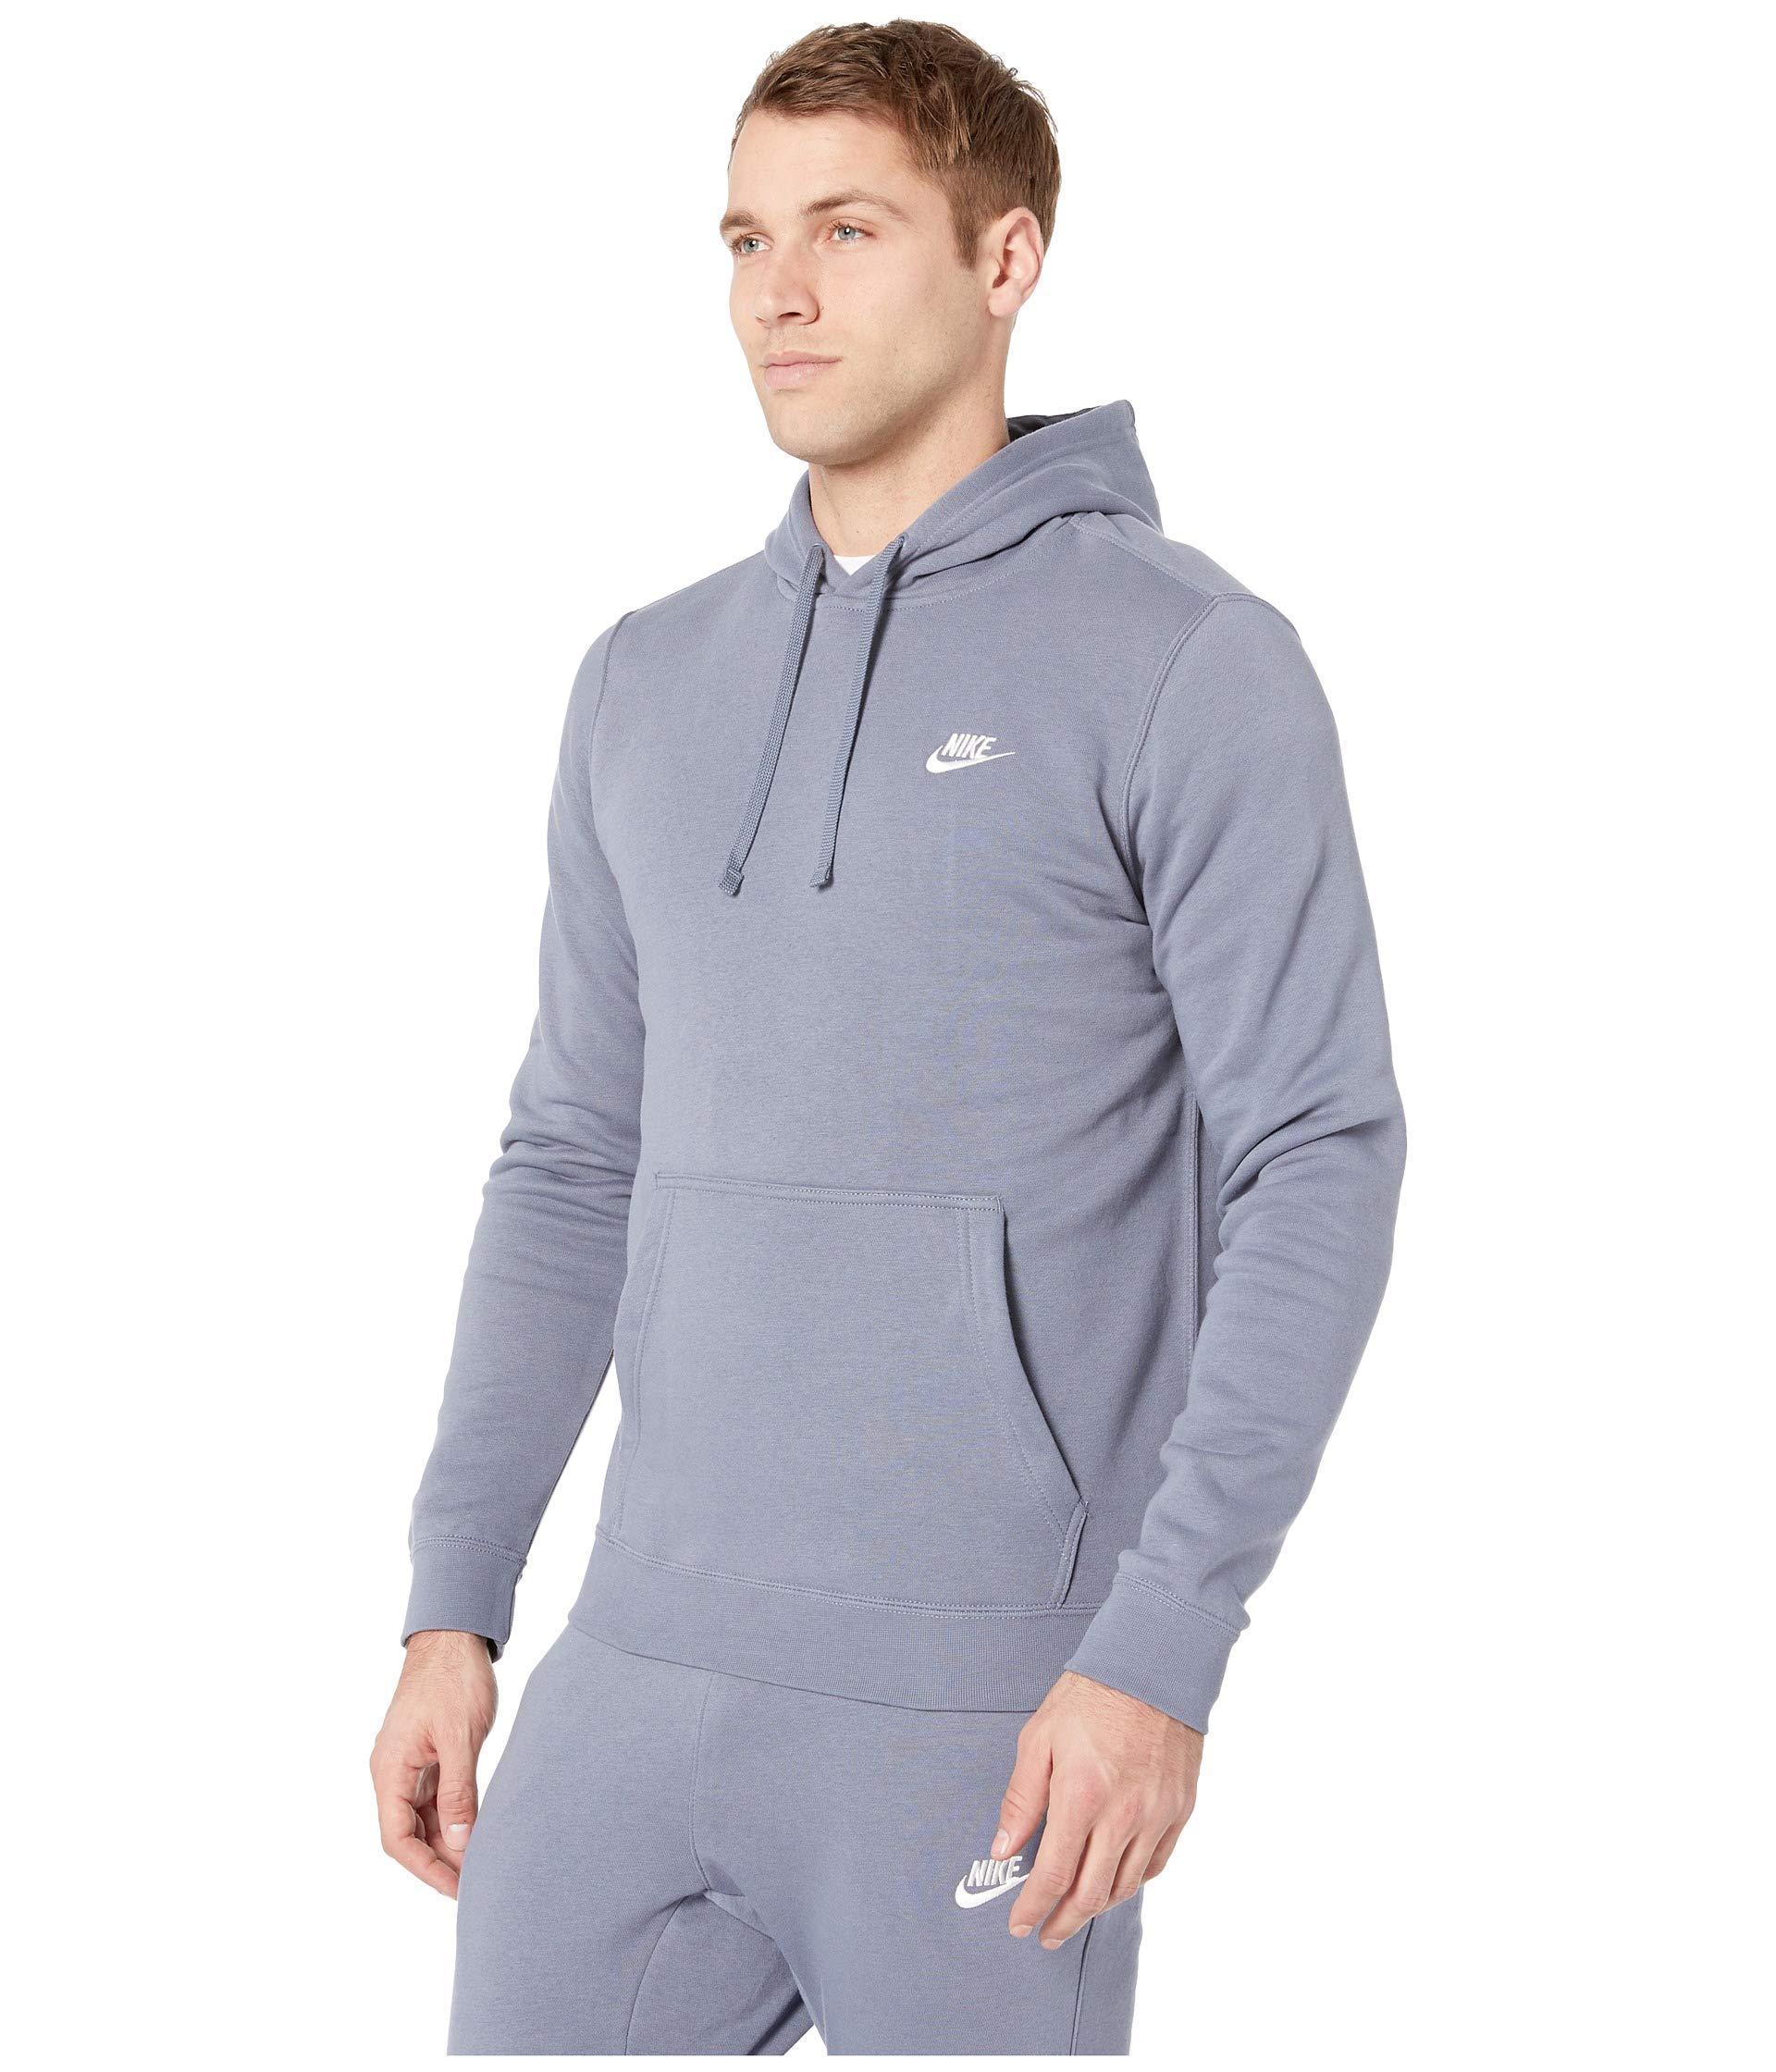 acb5b089919 Lyst - Nike Club Fleece Pullover Hoodie in Blue for Men